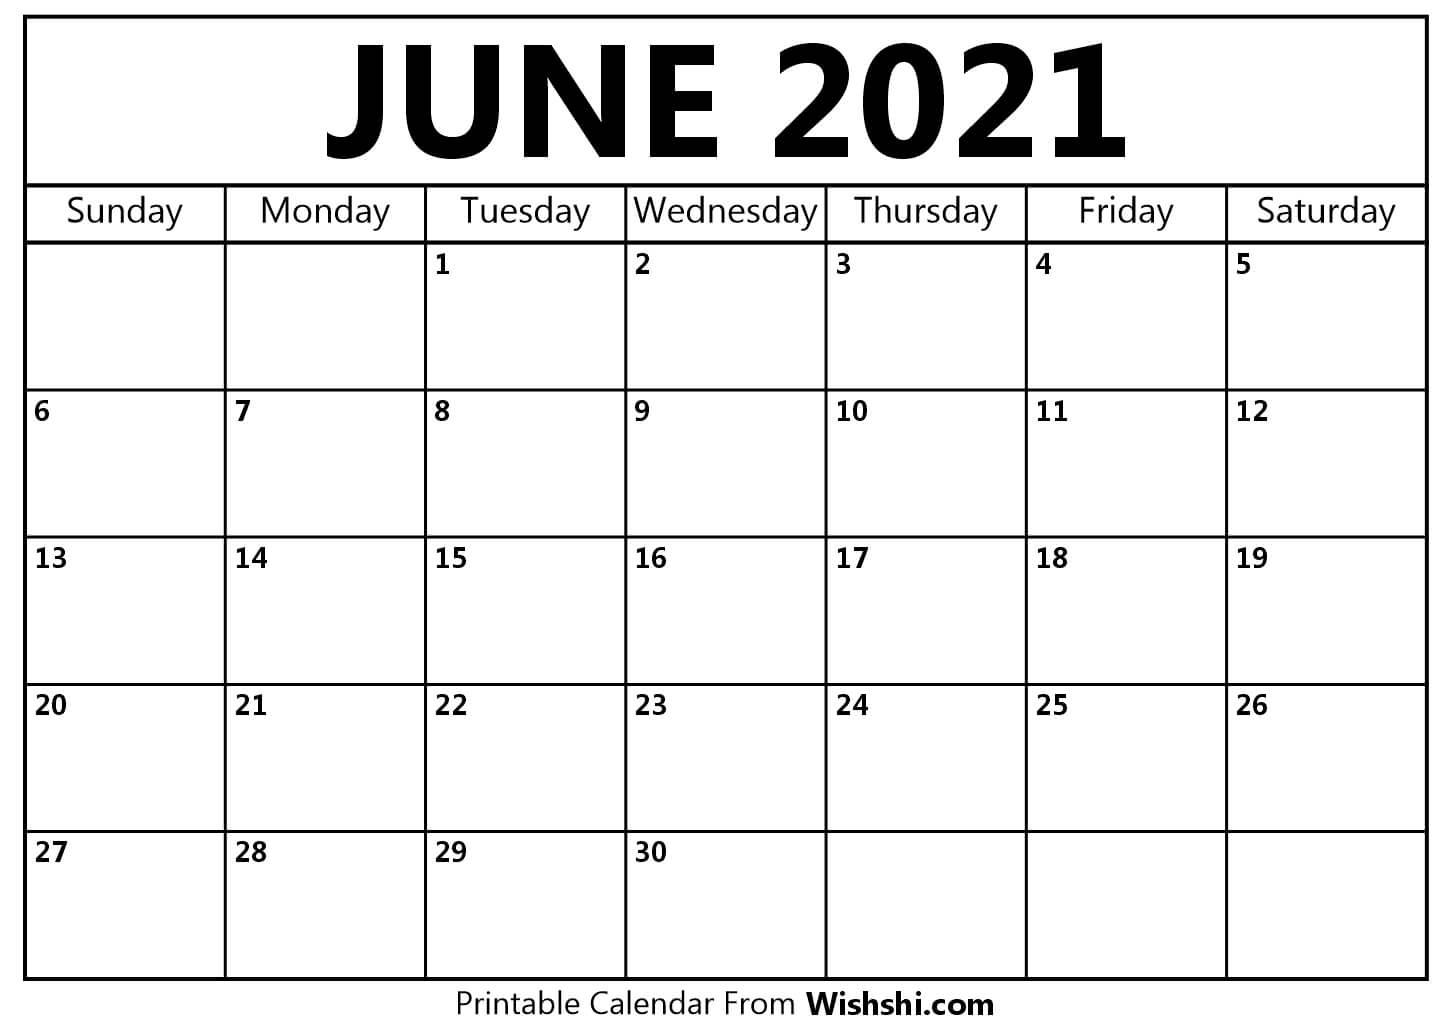 June 2021 Calendar Printable - Free Printable Calendars June 2021 Calendar Printable